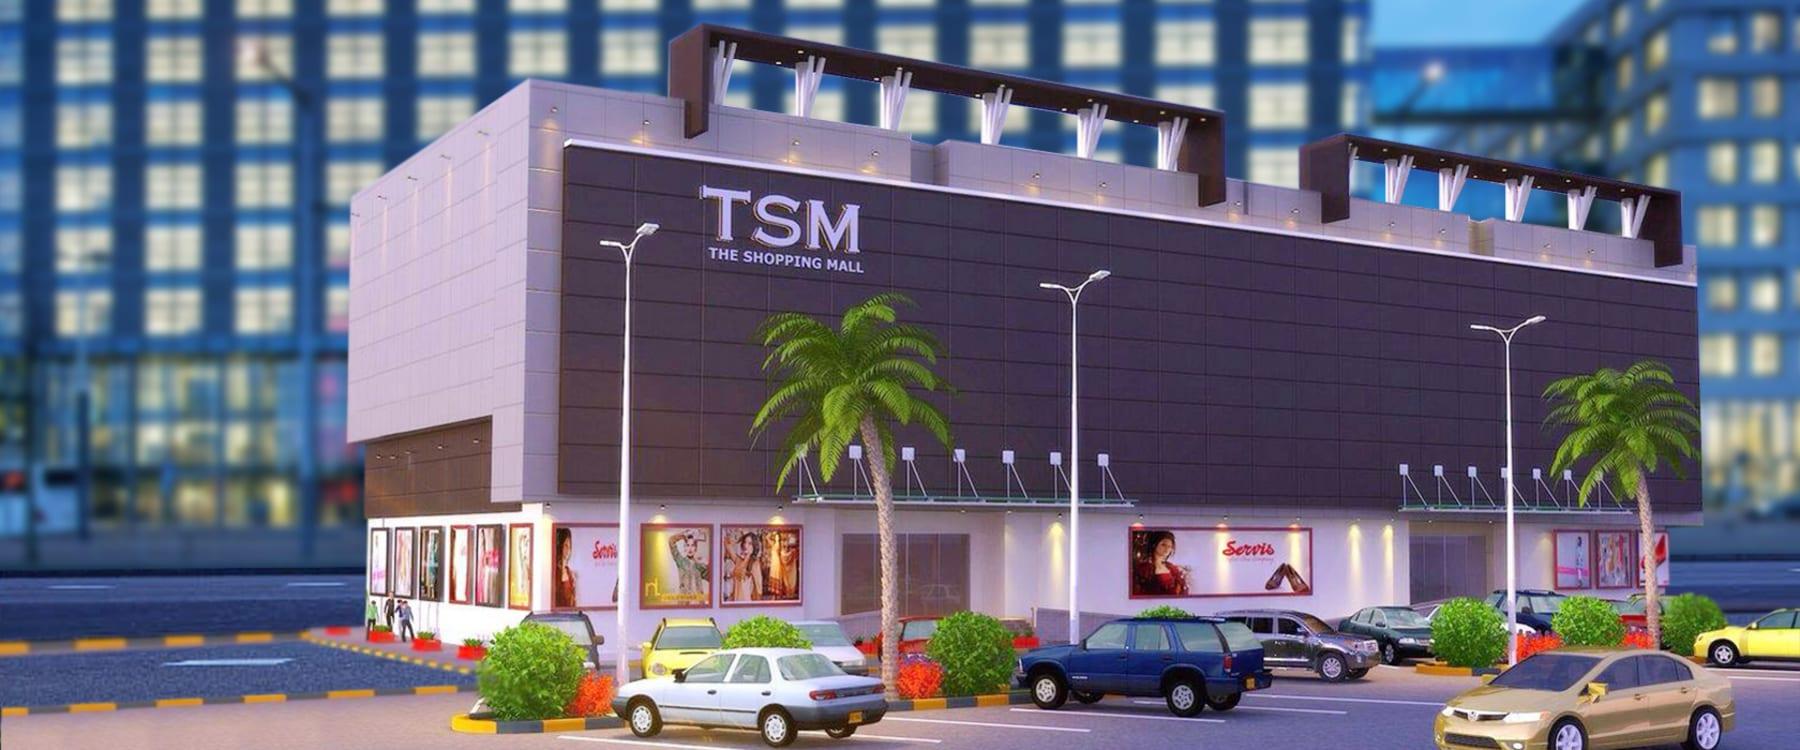 The Shopping Mall, Islamabad | Graana.com